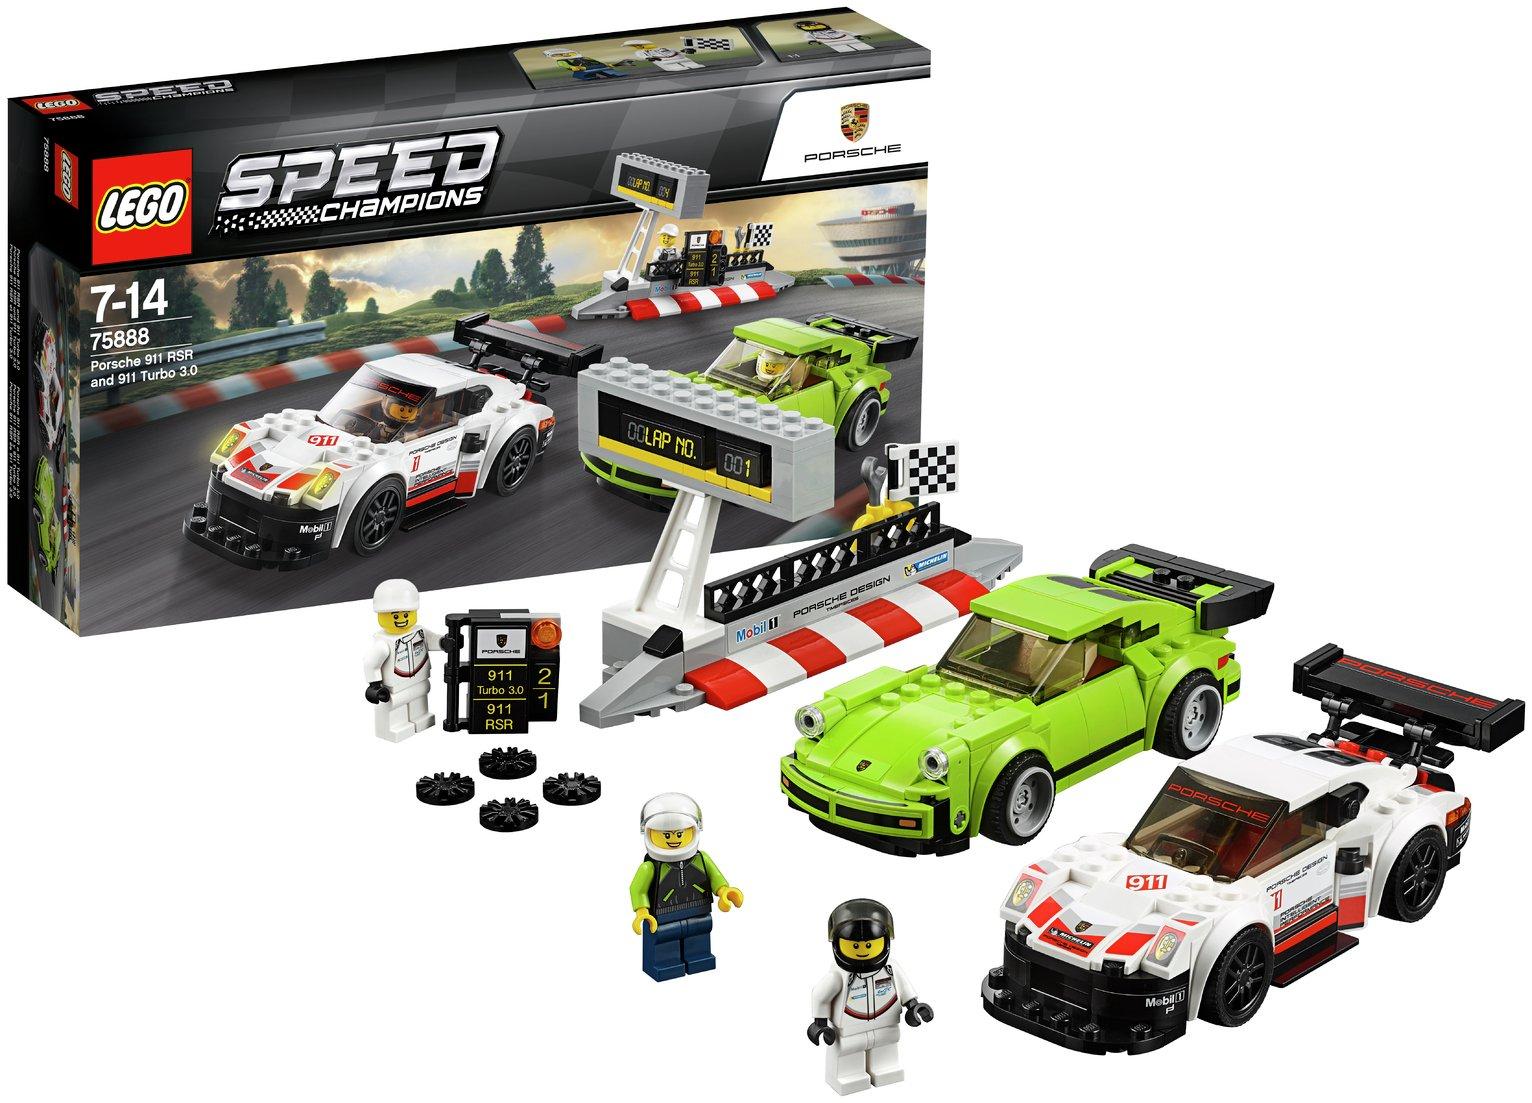 LEGO Speed Champions Porsche 911 RSR & 911 TURBO 3.0 - 75888